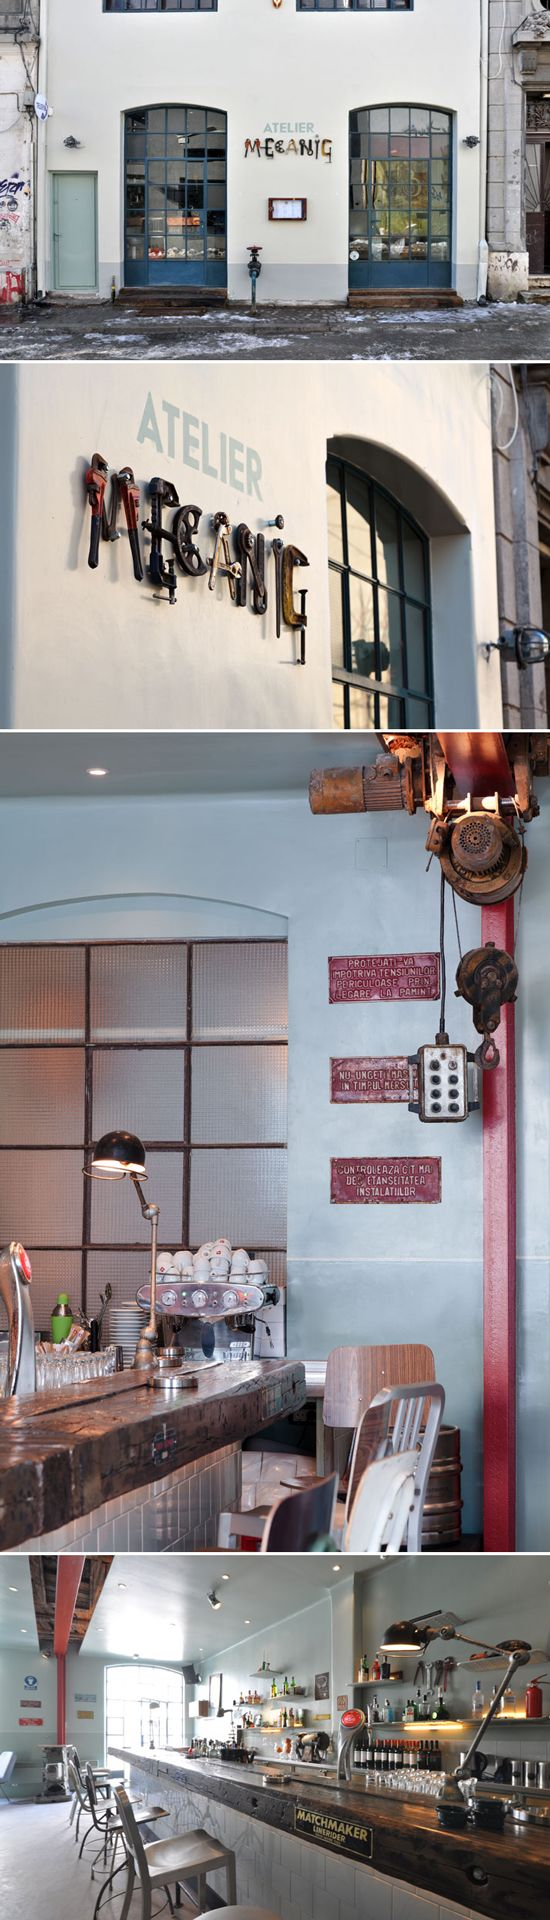 : Kitchens Spaces, Favorite Places, Subway Tile, Logos Design, Modern Industrial, Ate Mecan, Industrial Design, Vintage Industrial, Corvin Cristian